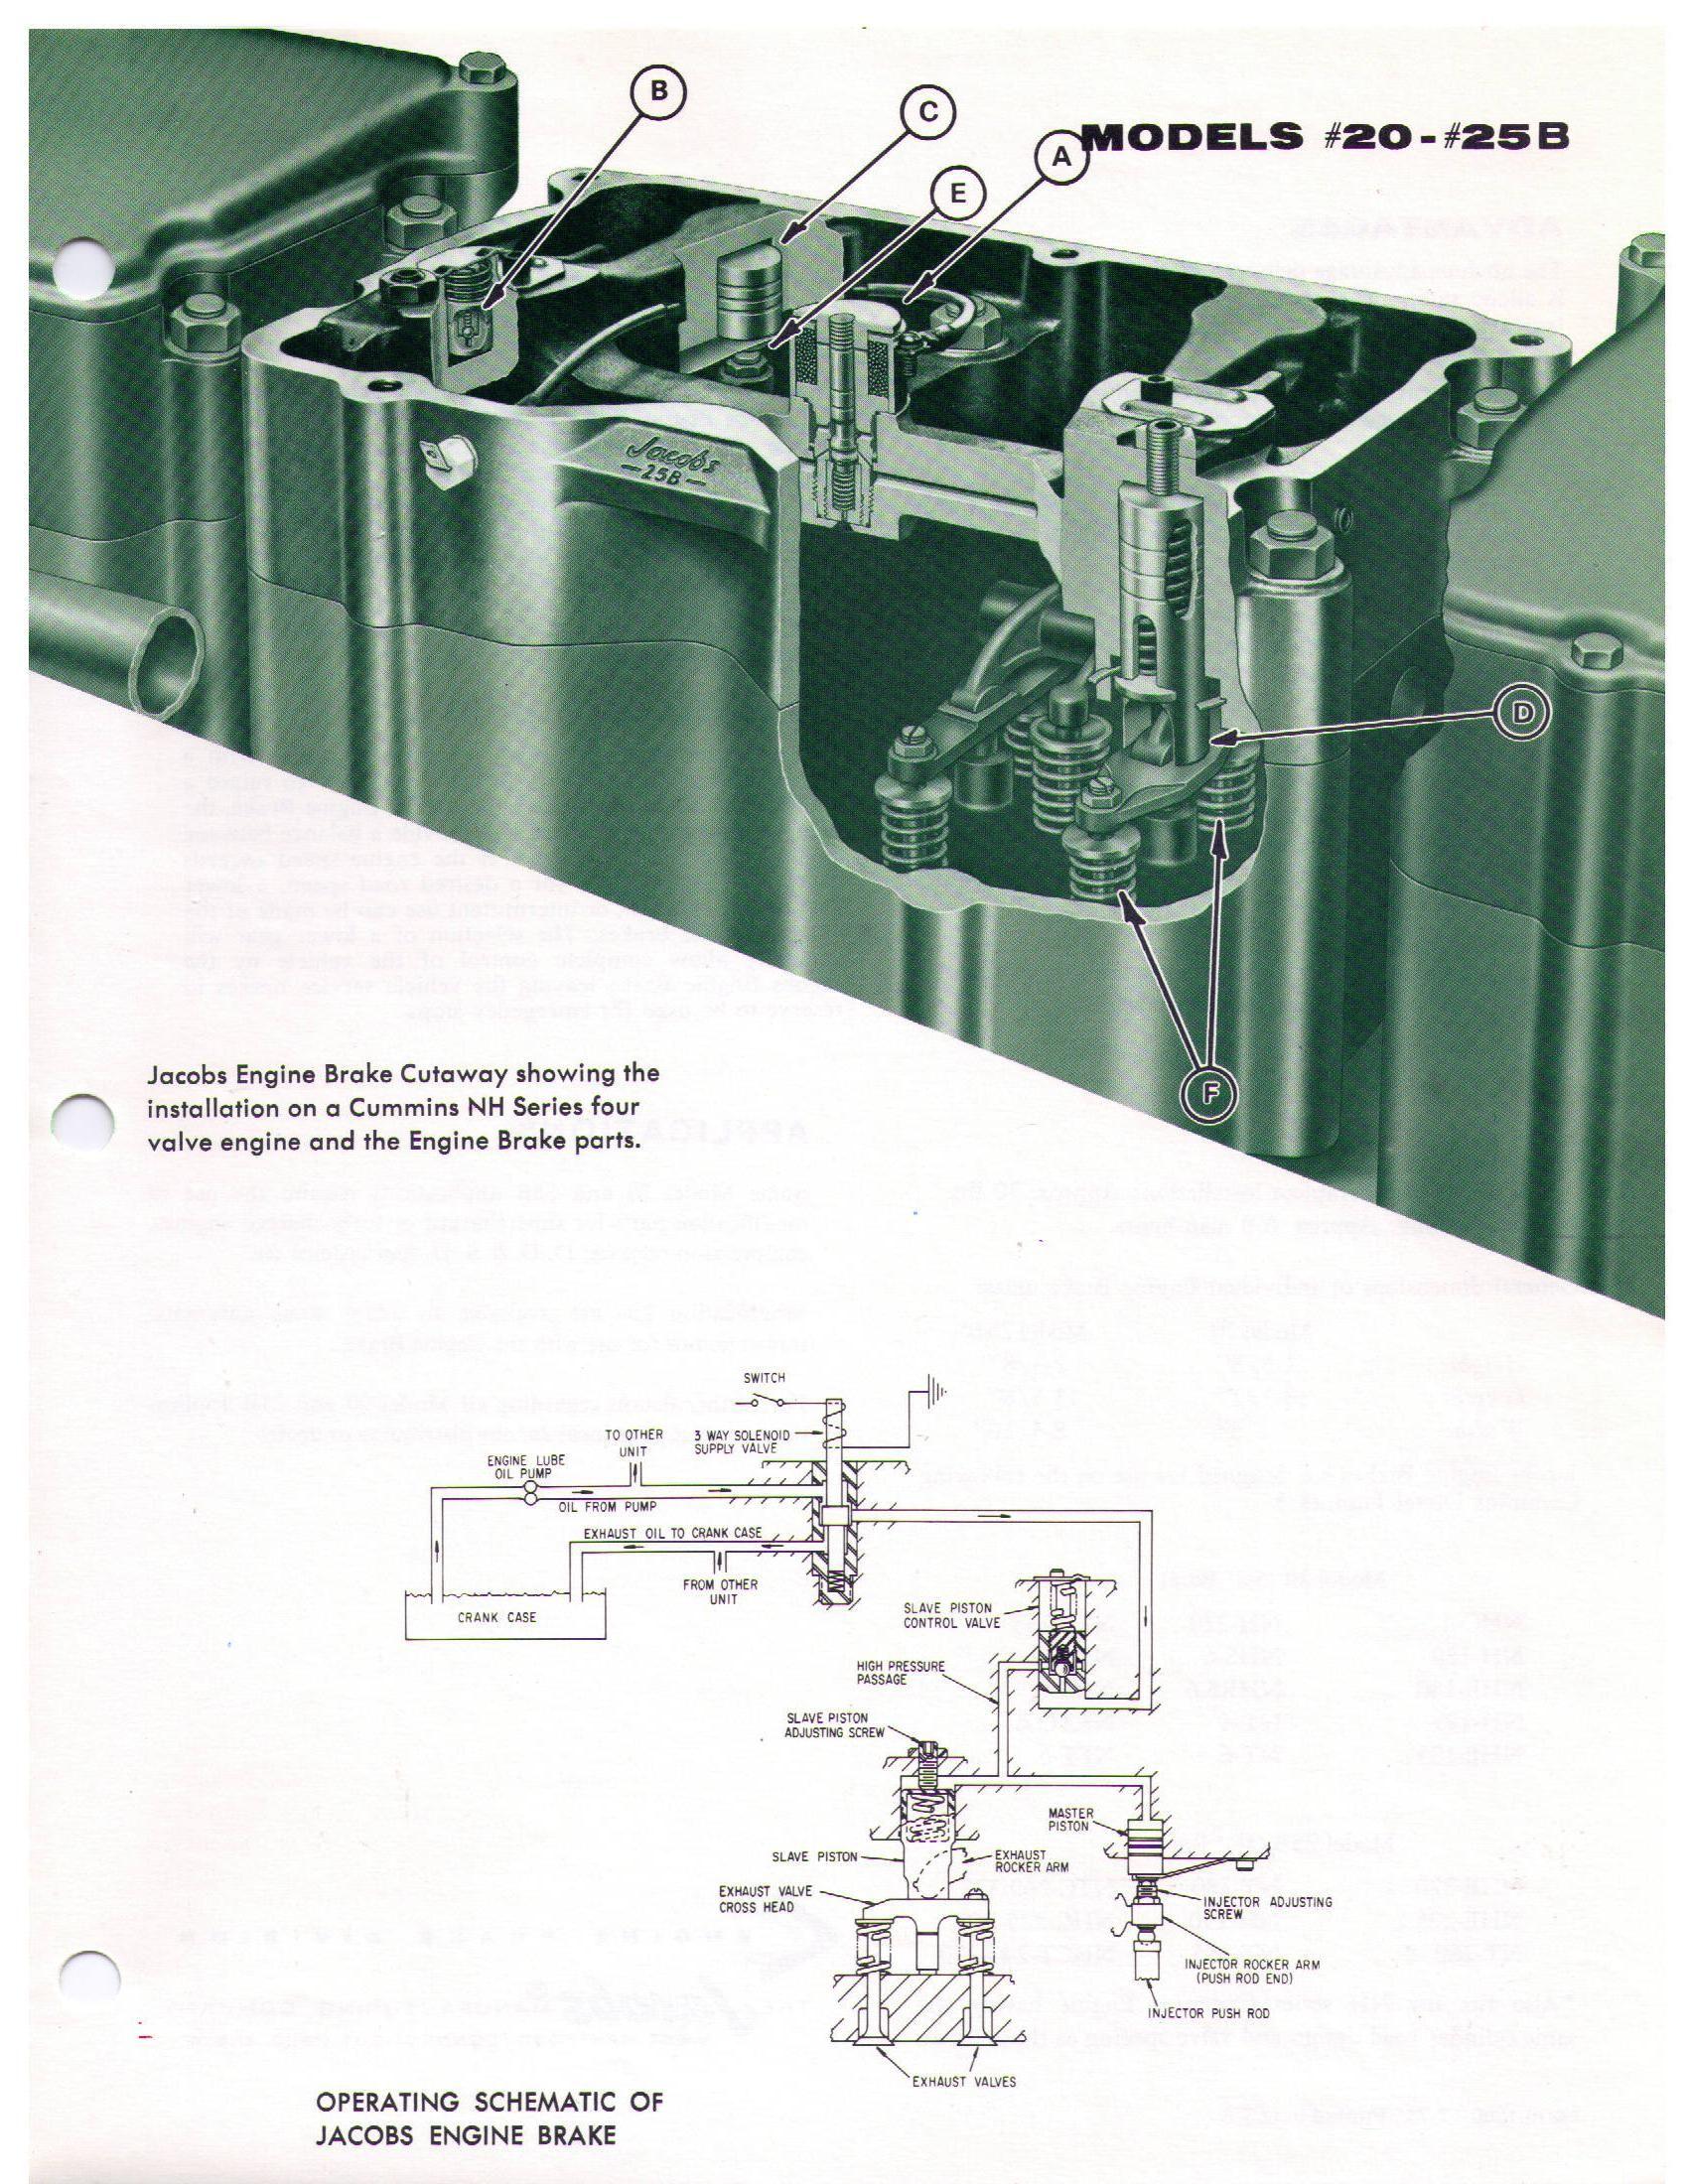 Jacobs Engine Brake Cummins Page 2 | Moteurs | Cummins